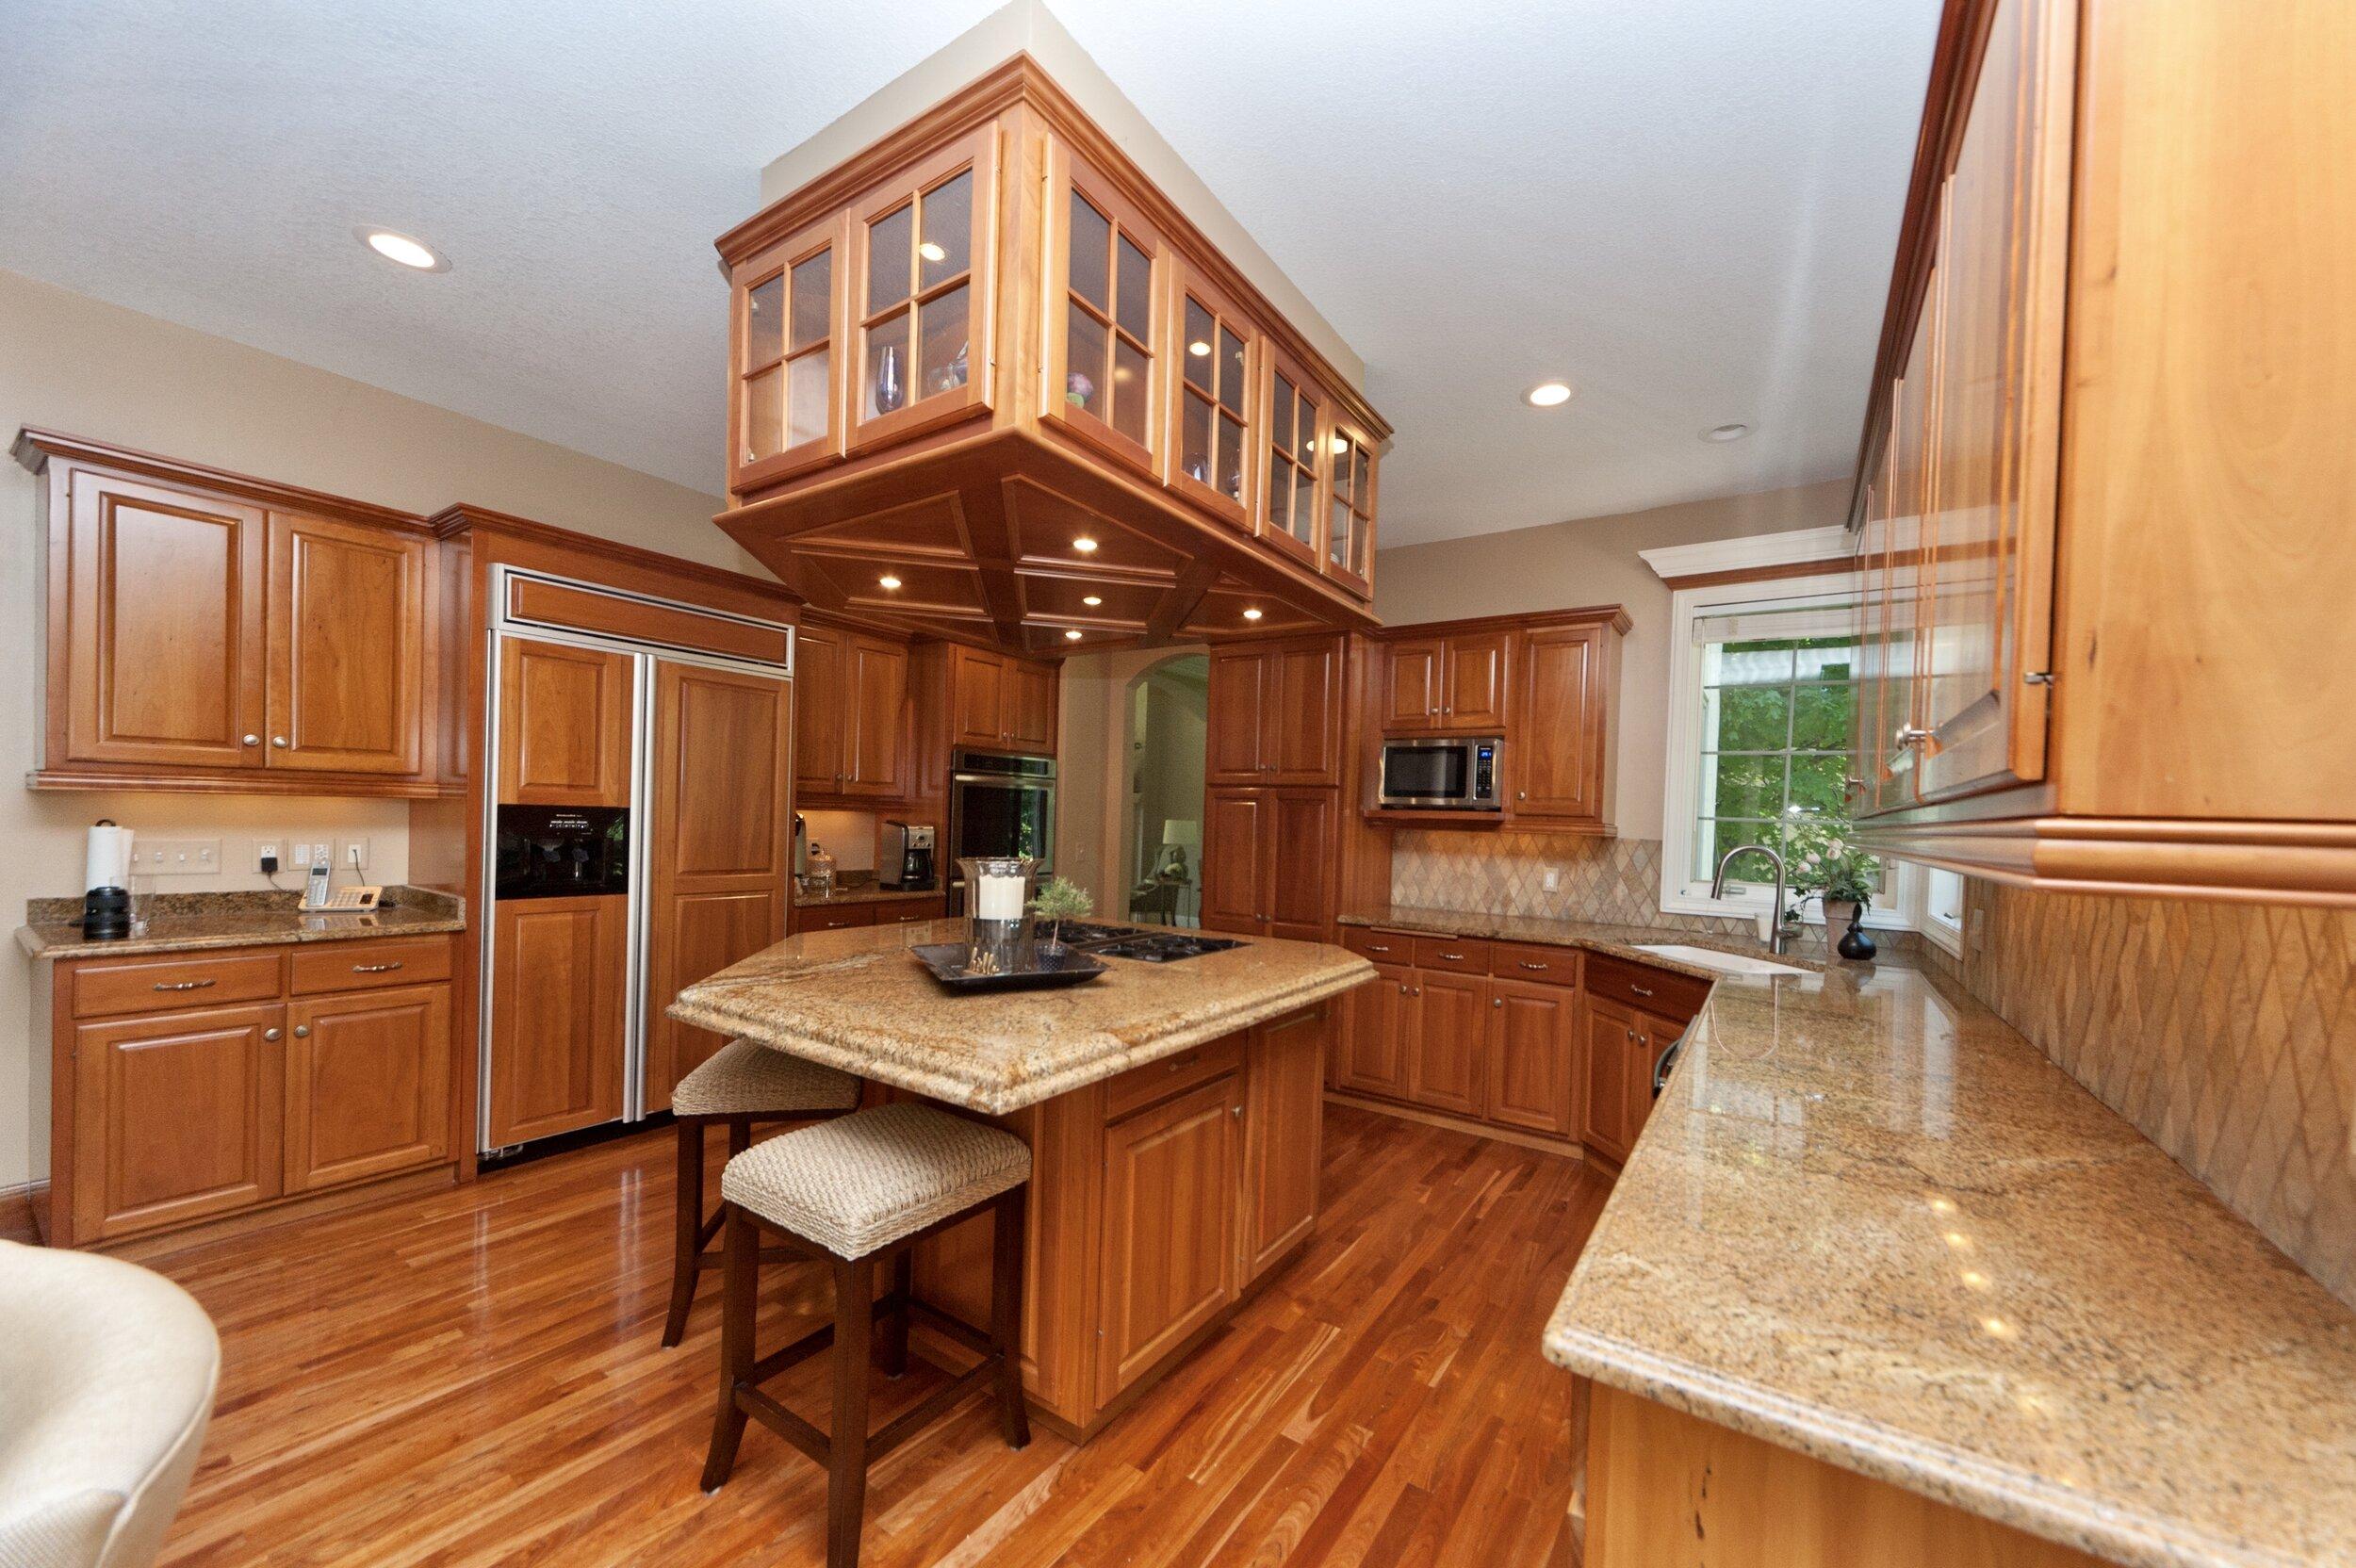 Cabinetry Artisan82 Interiors